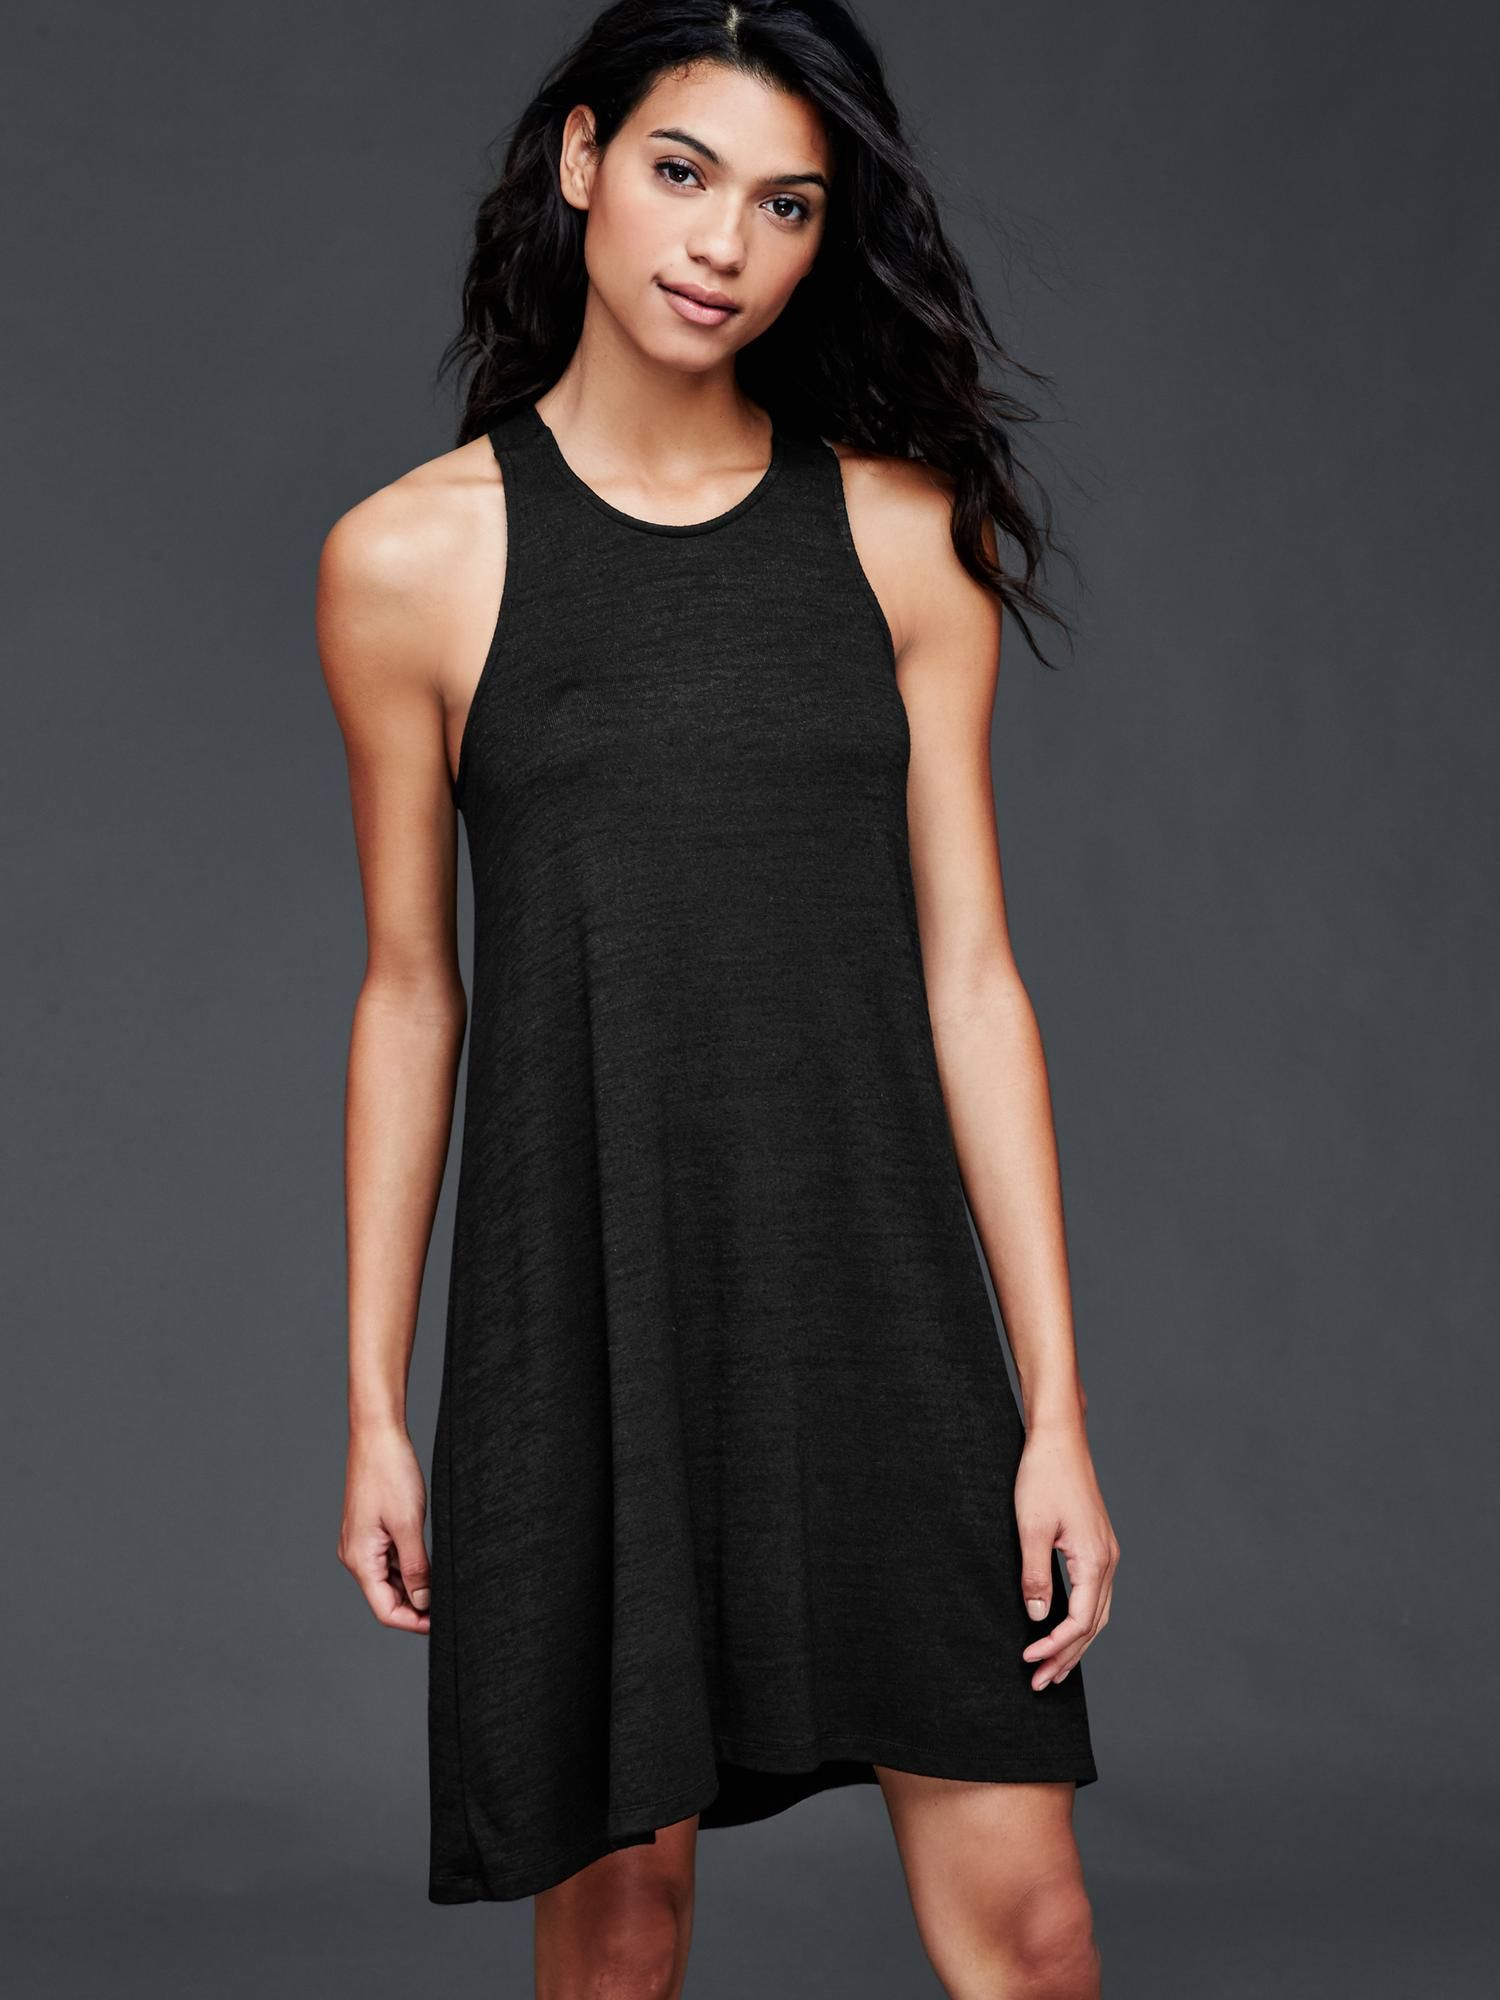 Softspun Knit Racerback Dress Racerback Dress Women Clothes Sale Dresses [ 2000 x 1500 Pixel ]